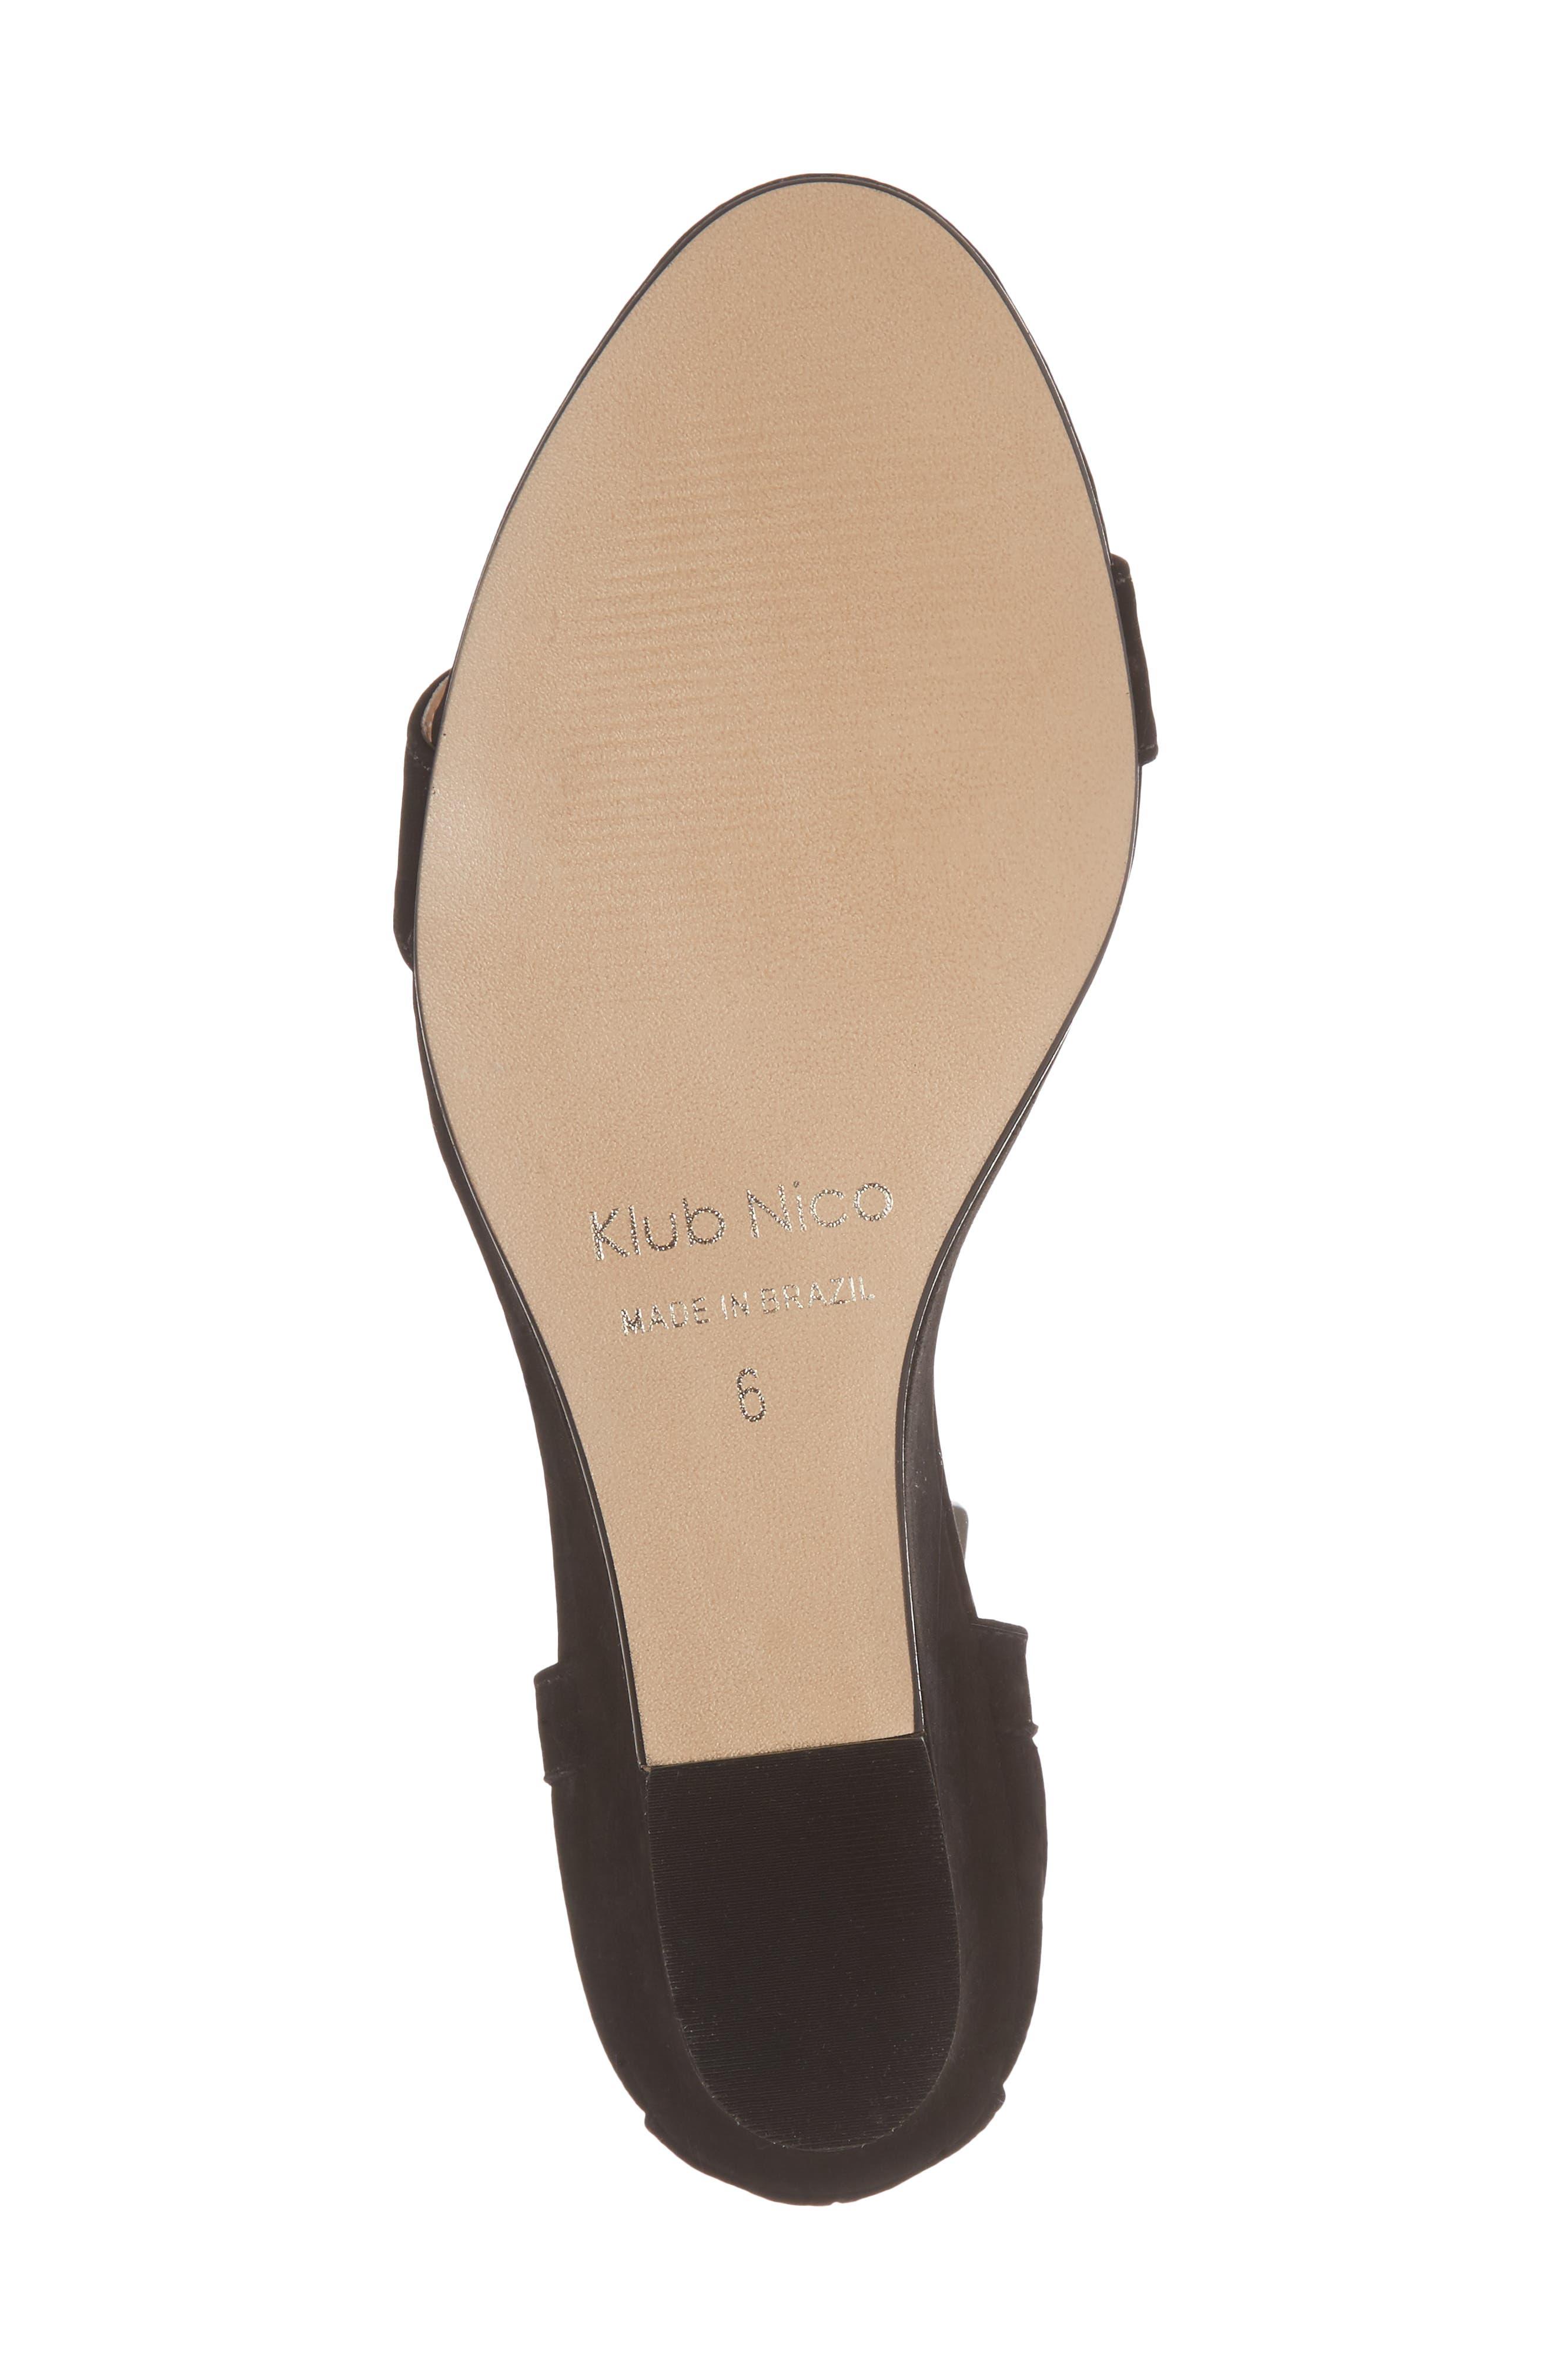 Kaeli Wedge Sandal,                             Alternate thumbnail 6, color,                             Black Leather